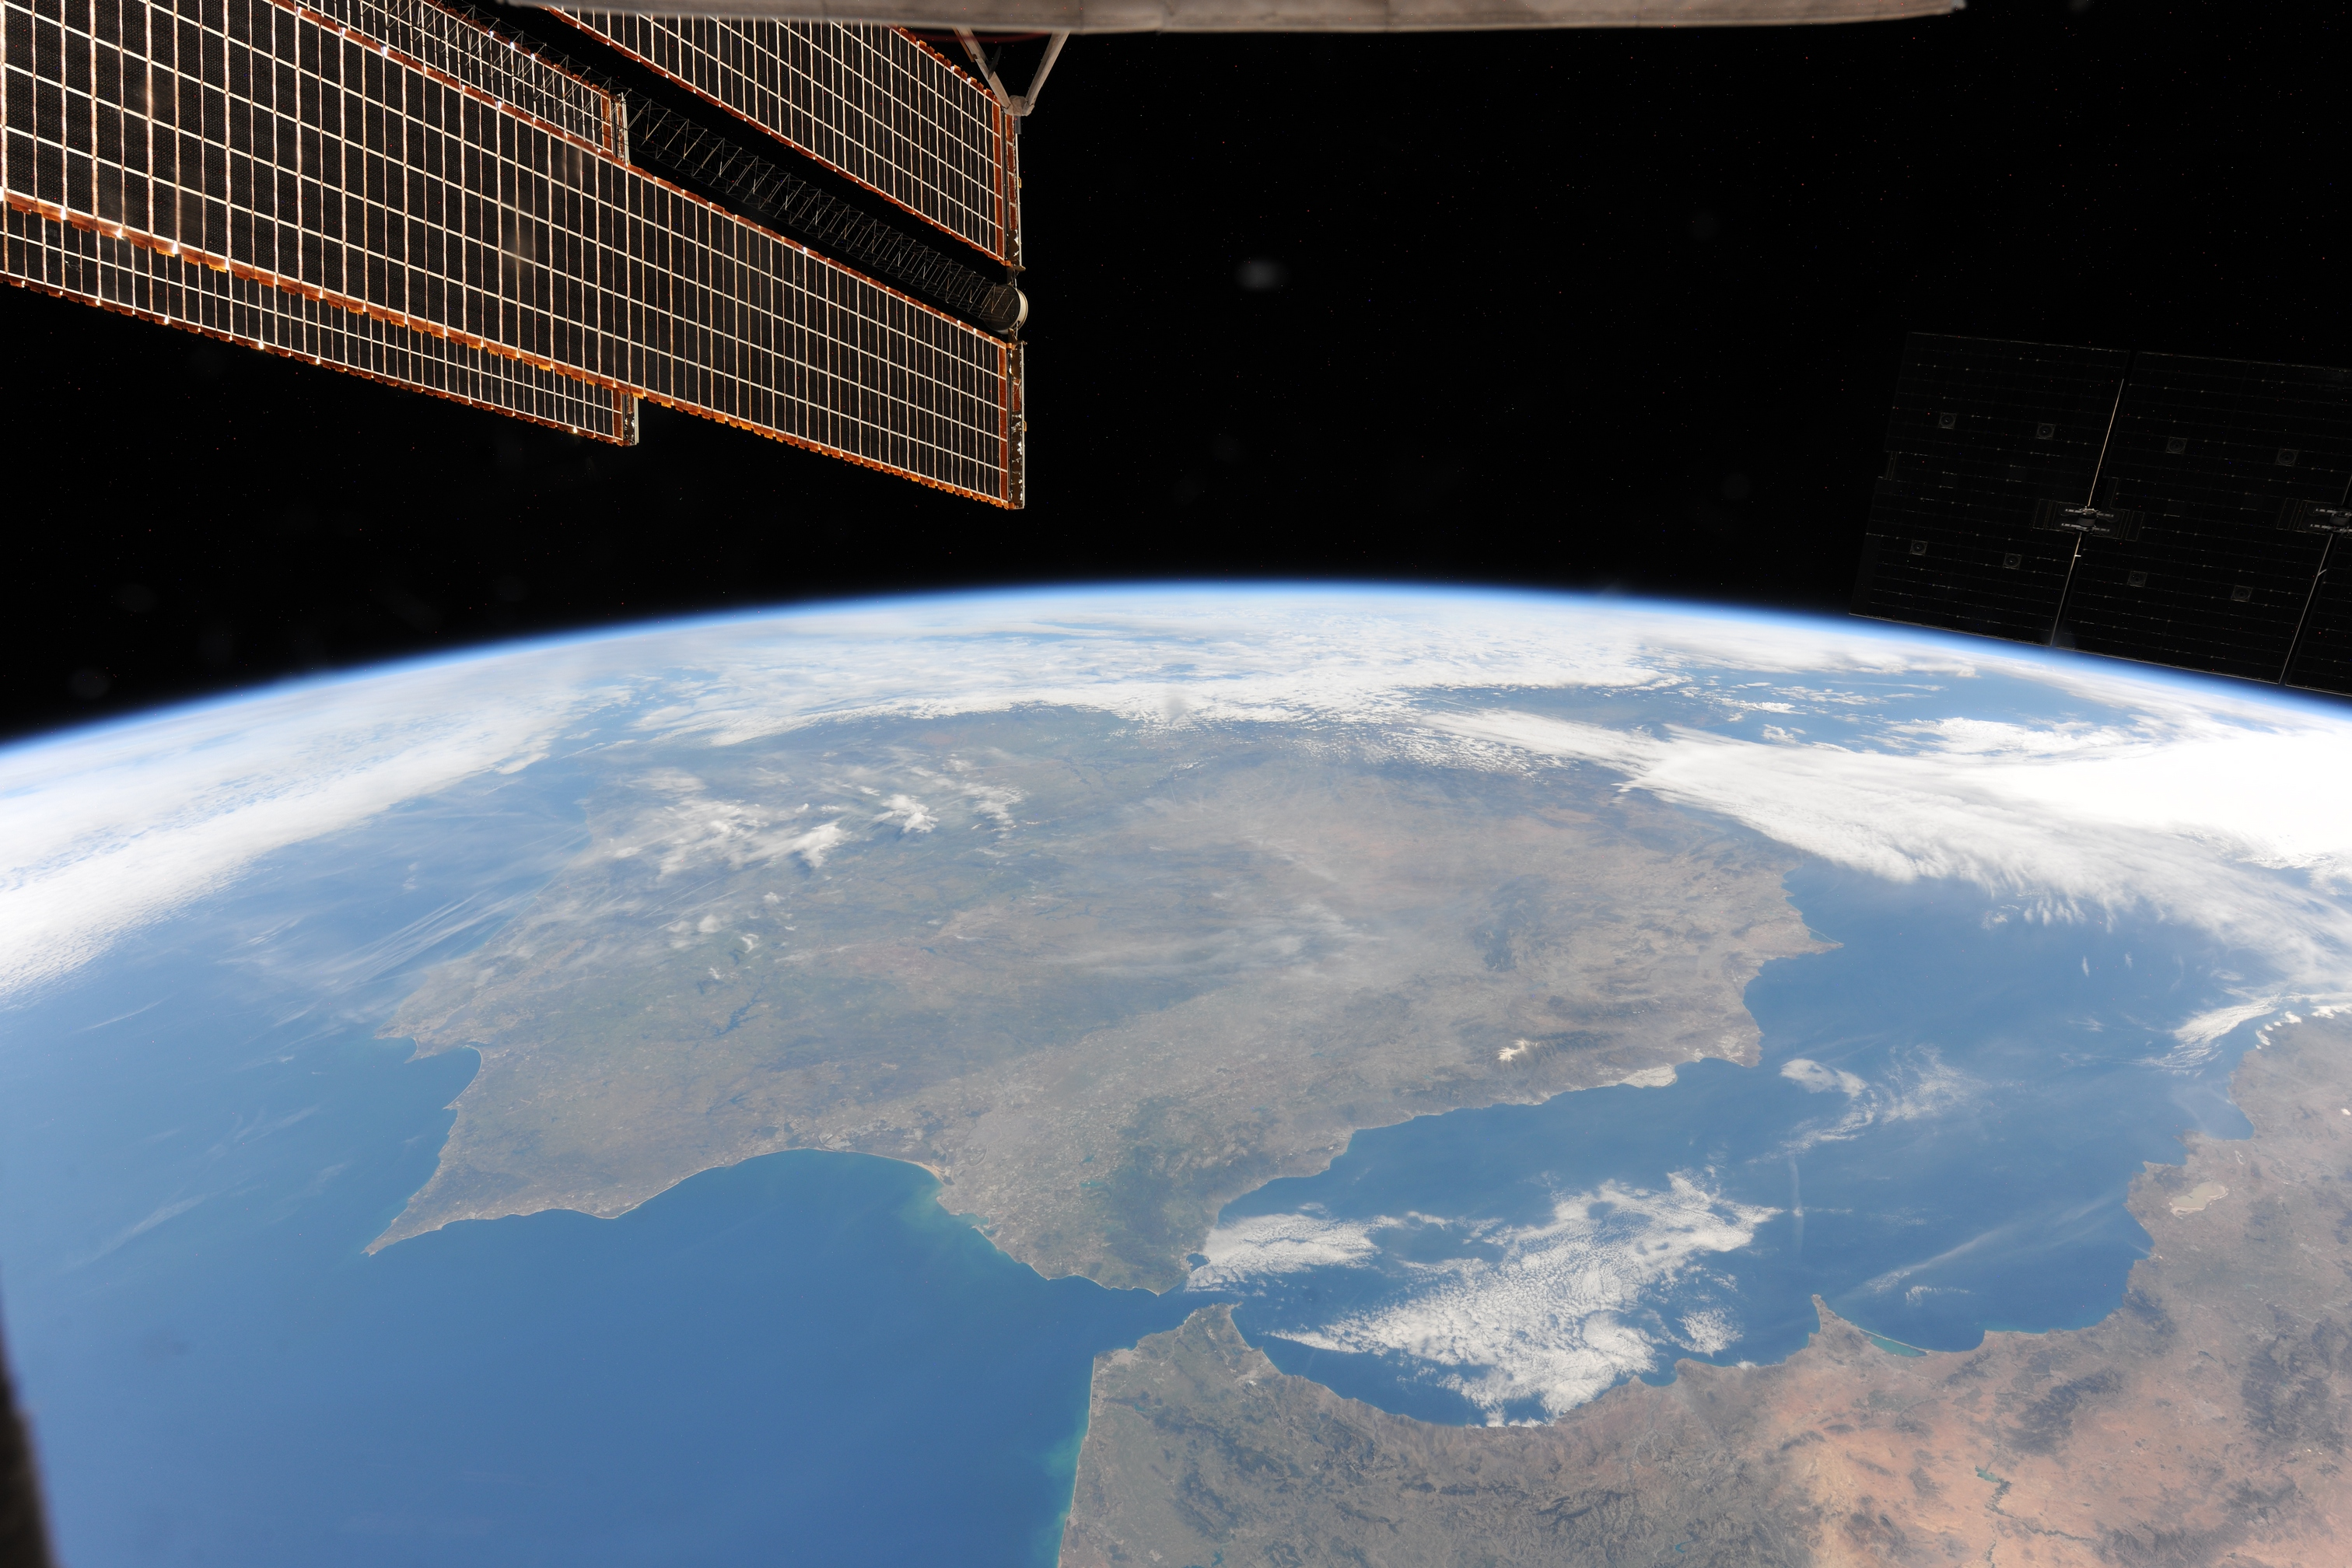 орбитальная фотогалерея - гибралтар